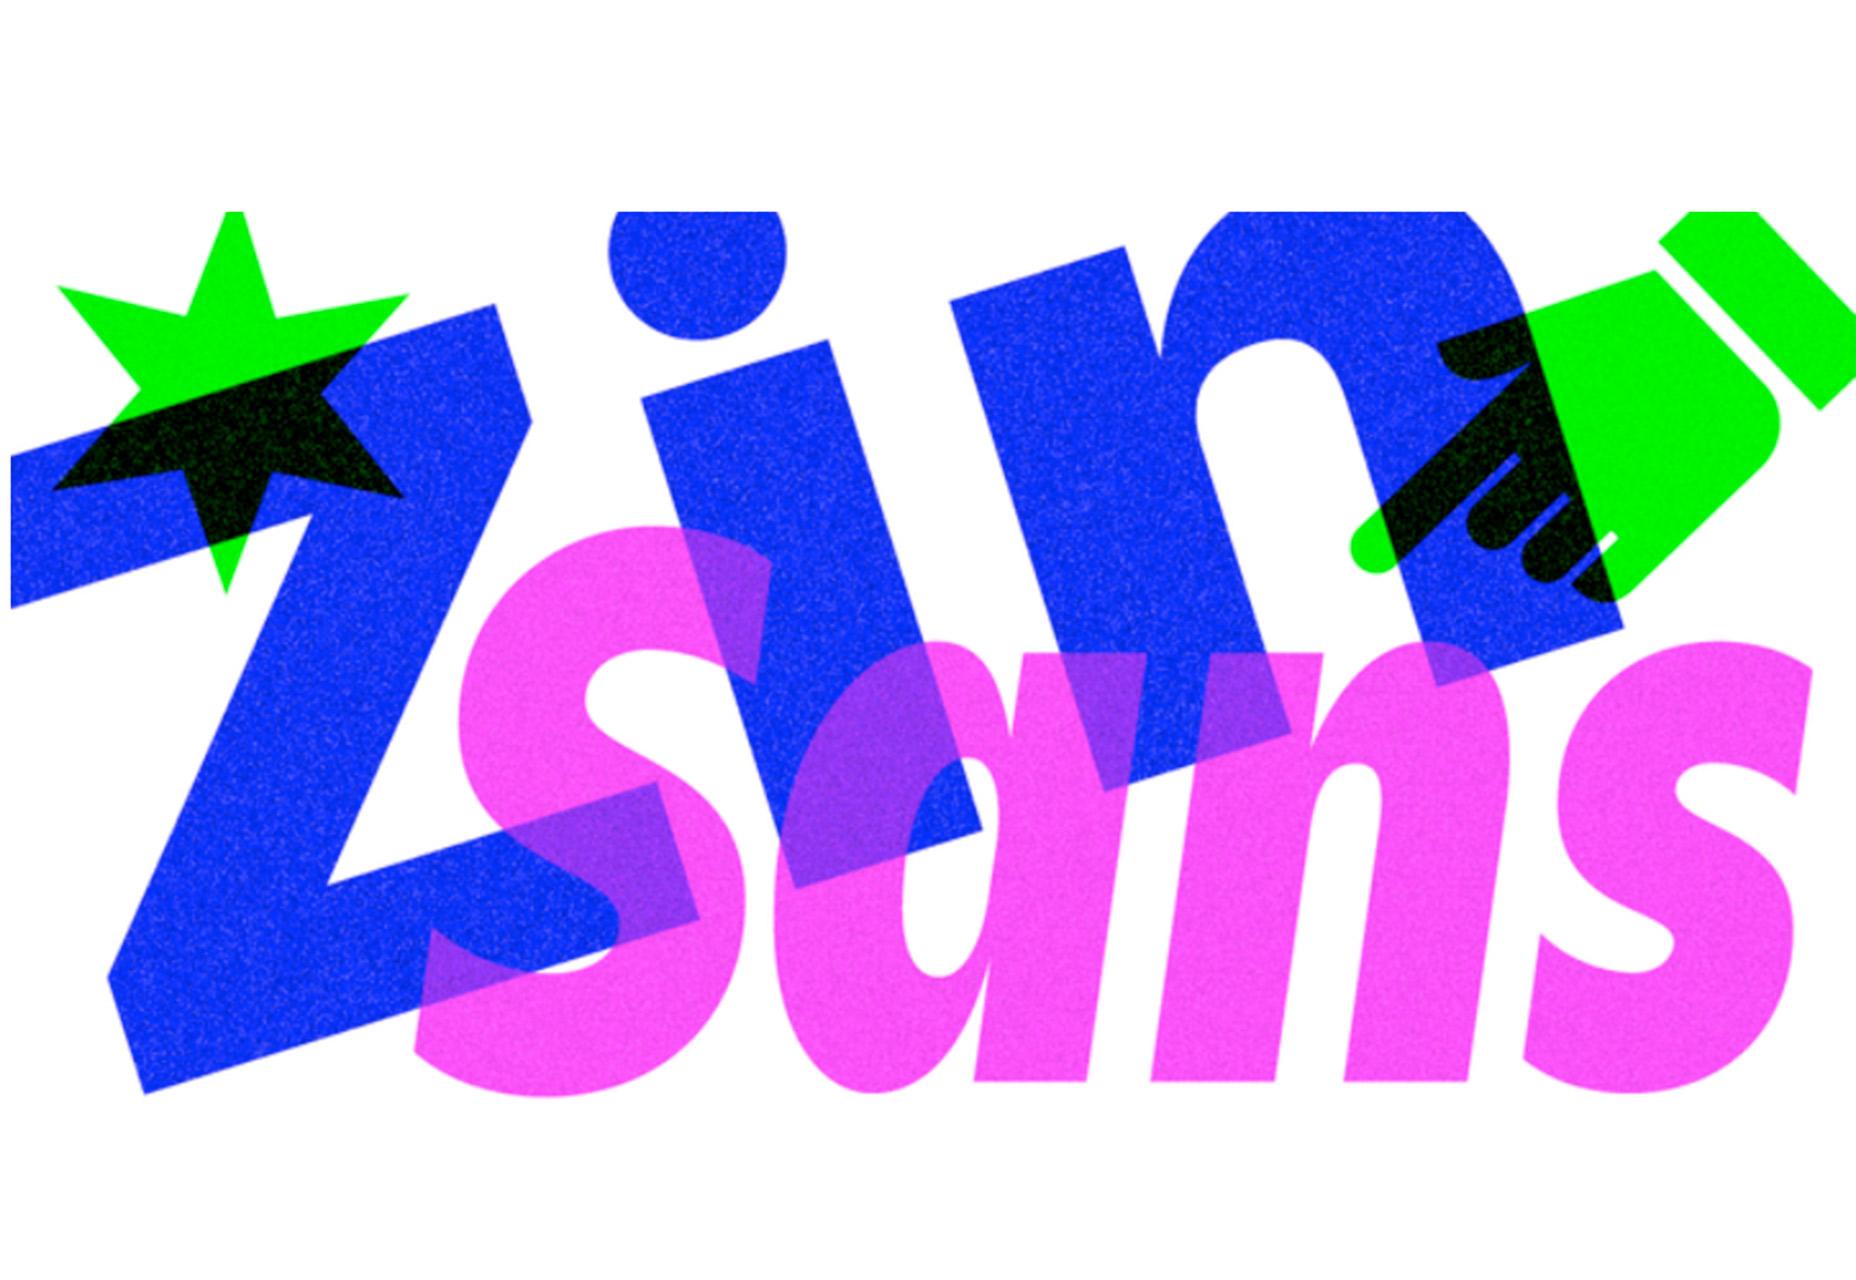 Zin-sans